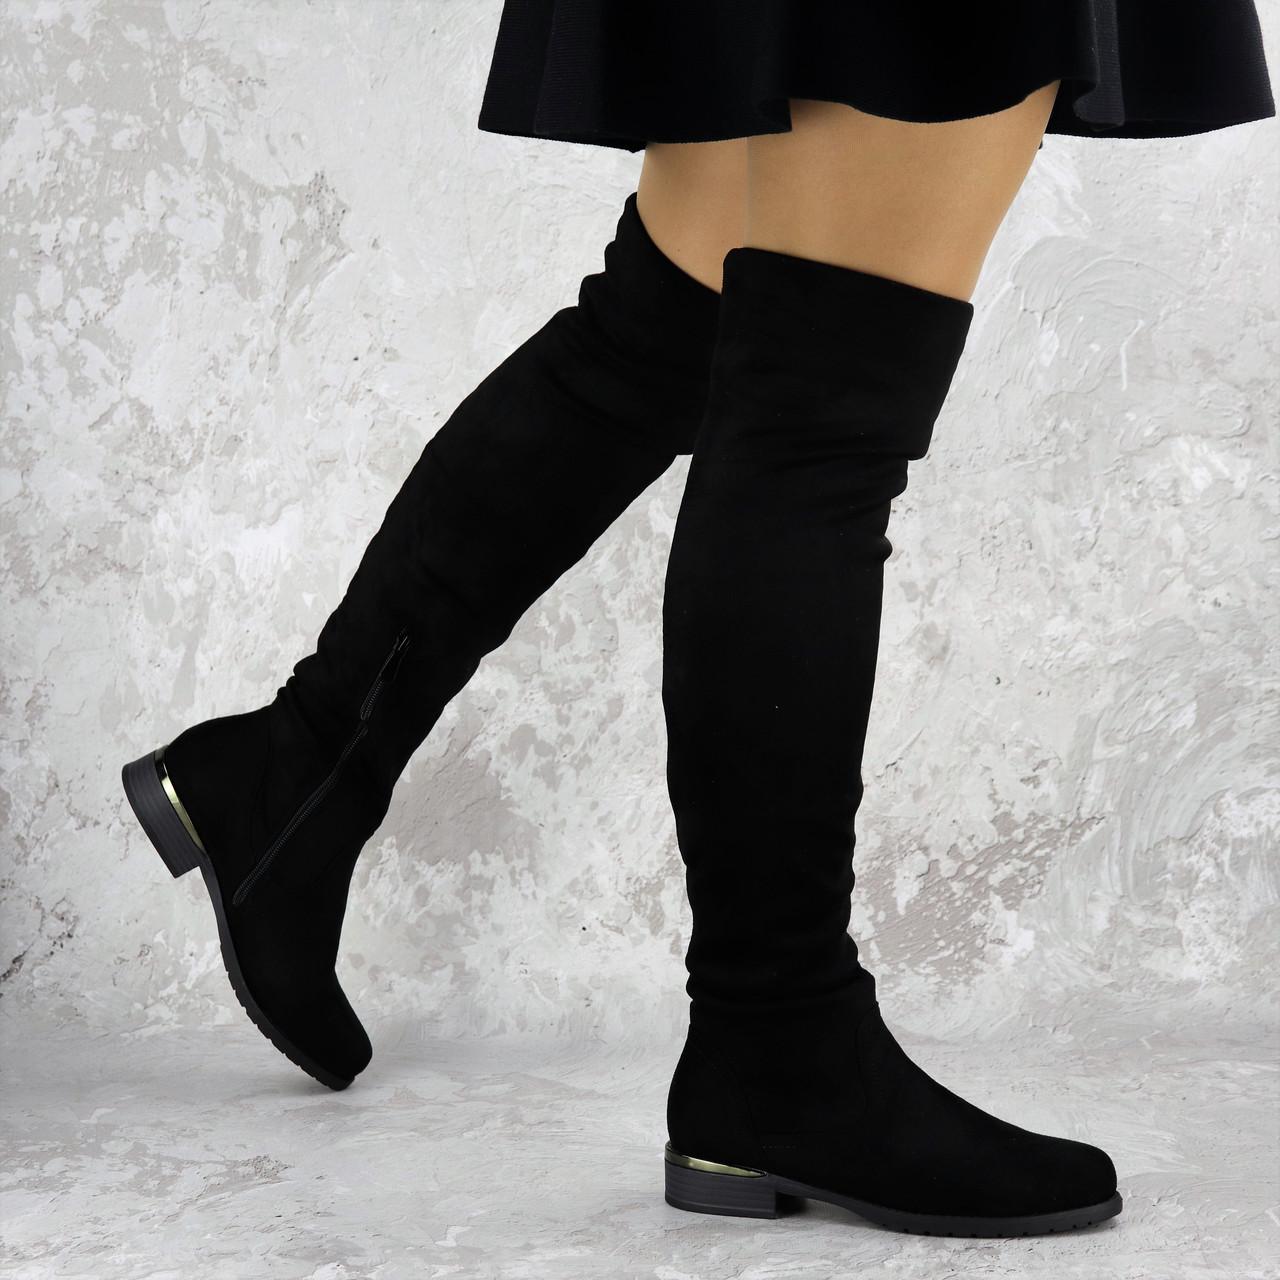 Женские ботфорты Fashion Nabbenna 1371 36 размер 23,5 см Черный